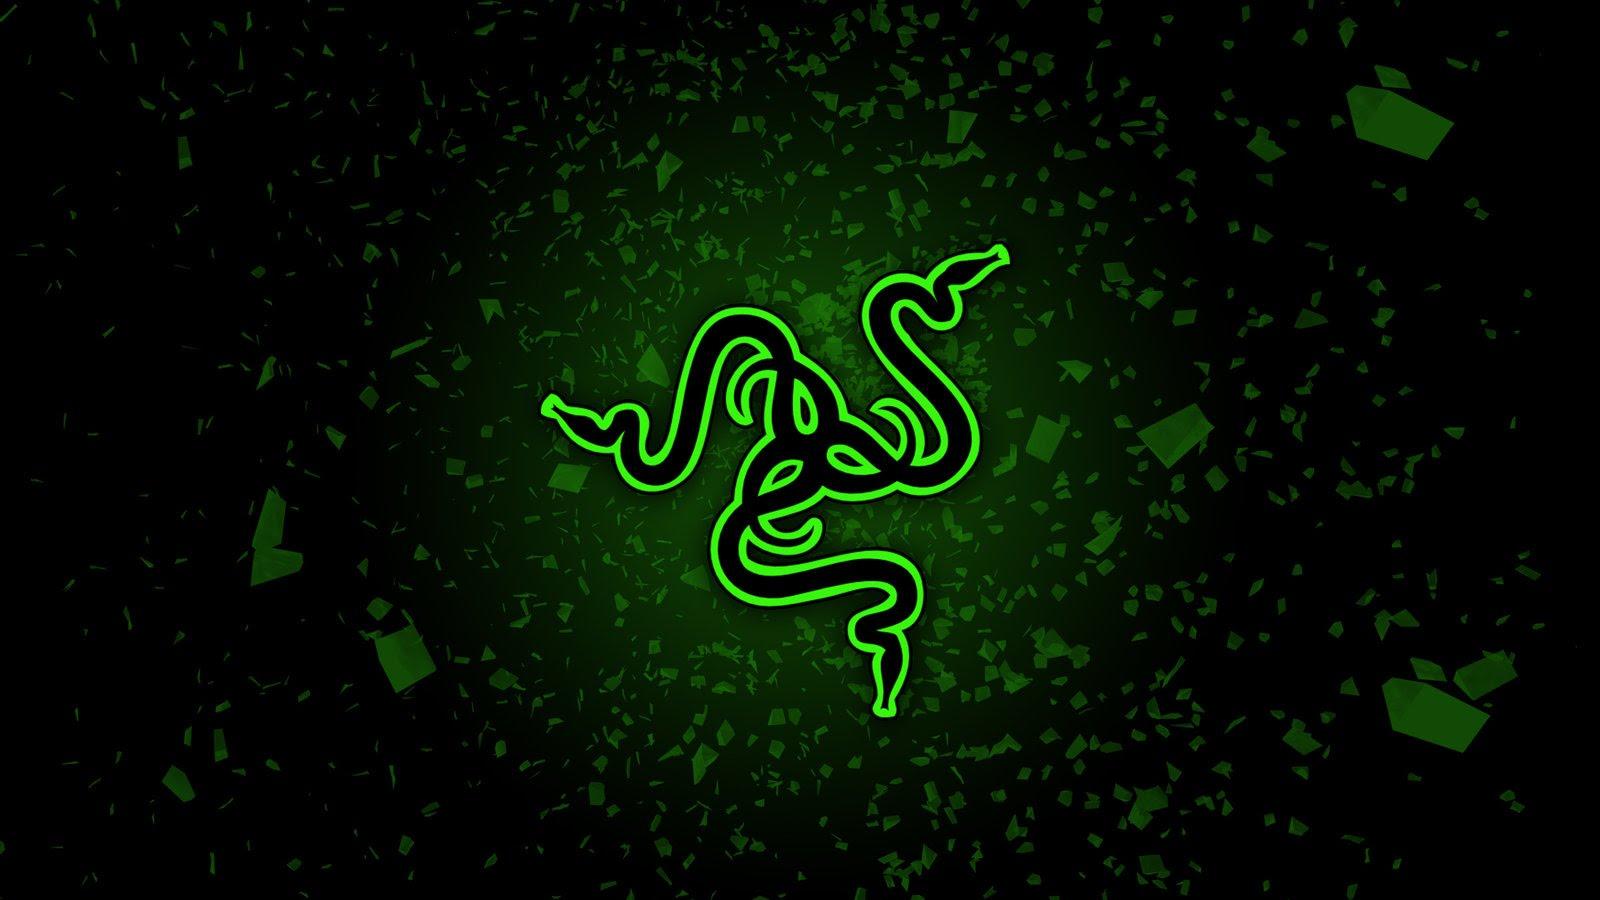 Logo de la firma Razer en verde